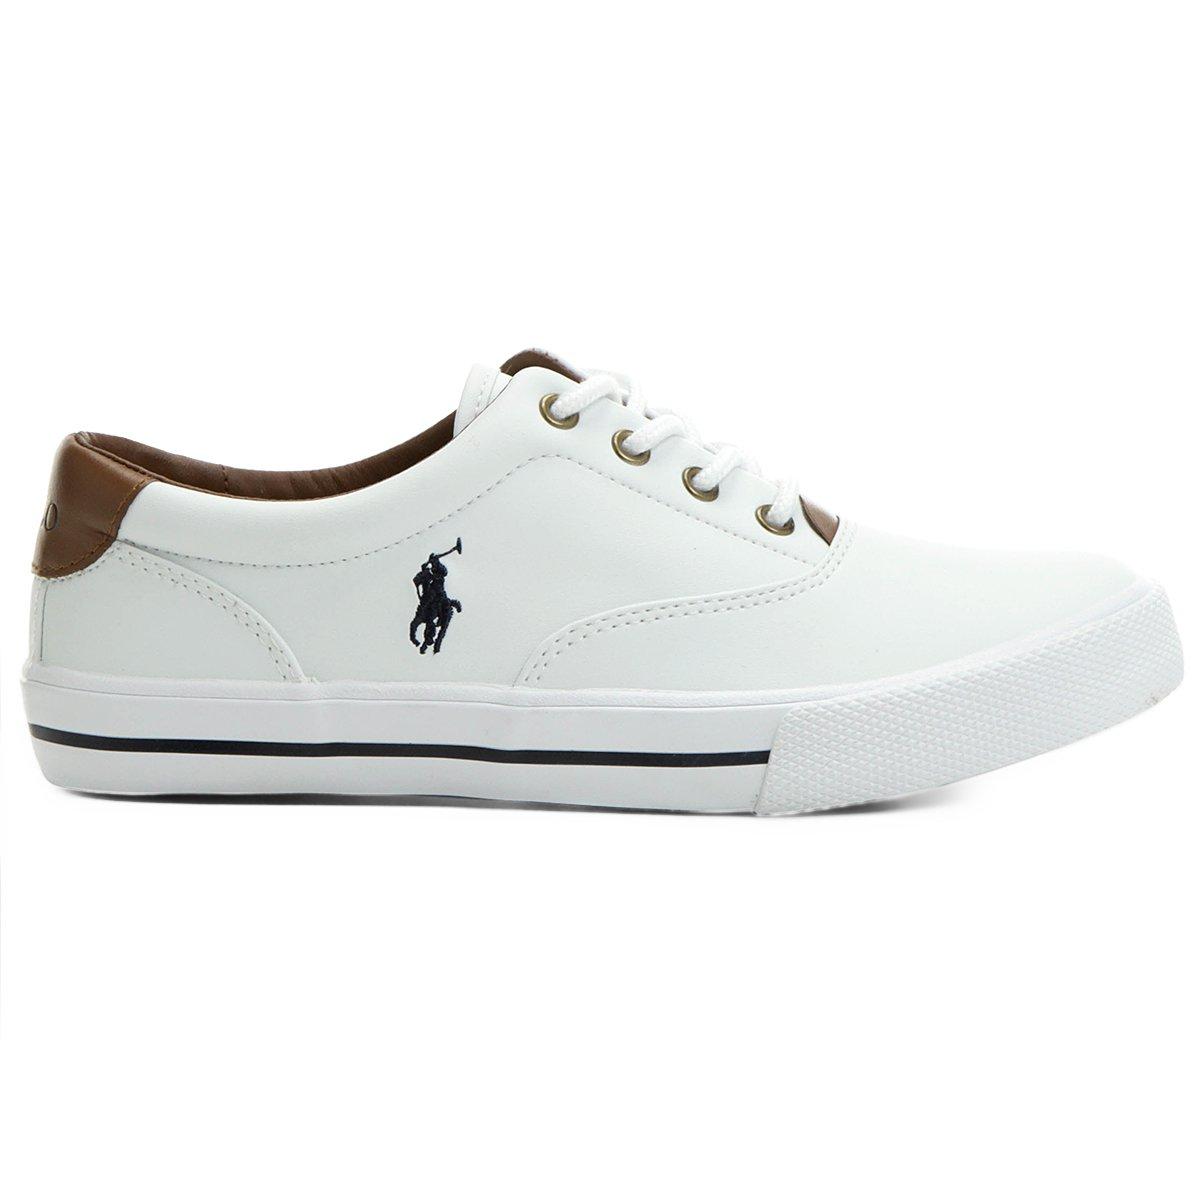 Tênis Polo Ralph Lauren Vaughn - Compre Agora  d26060896df